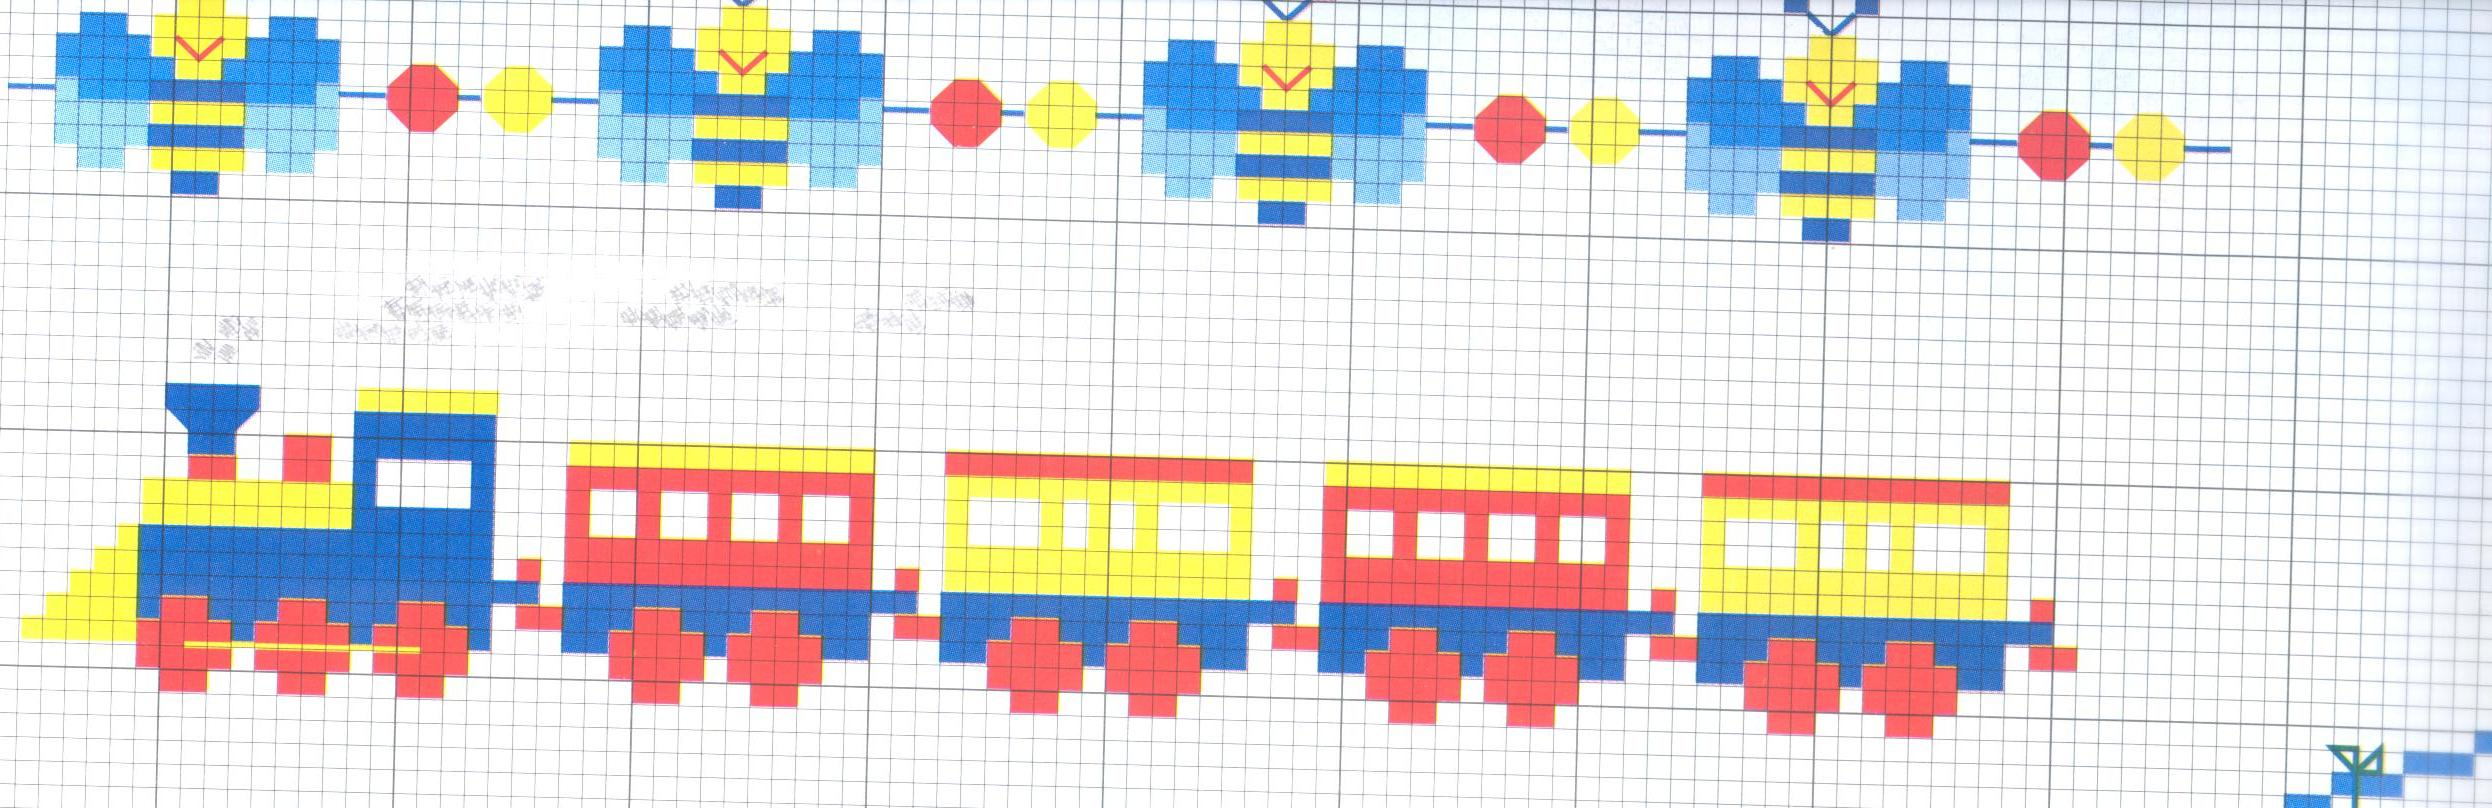 Schema punto croce trenino